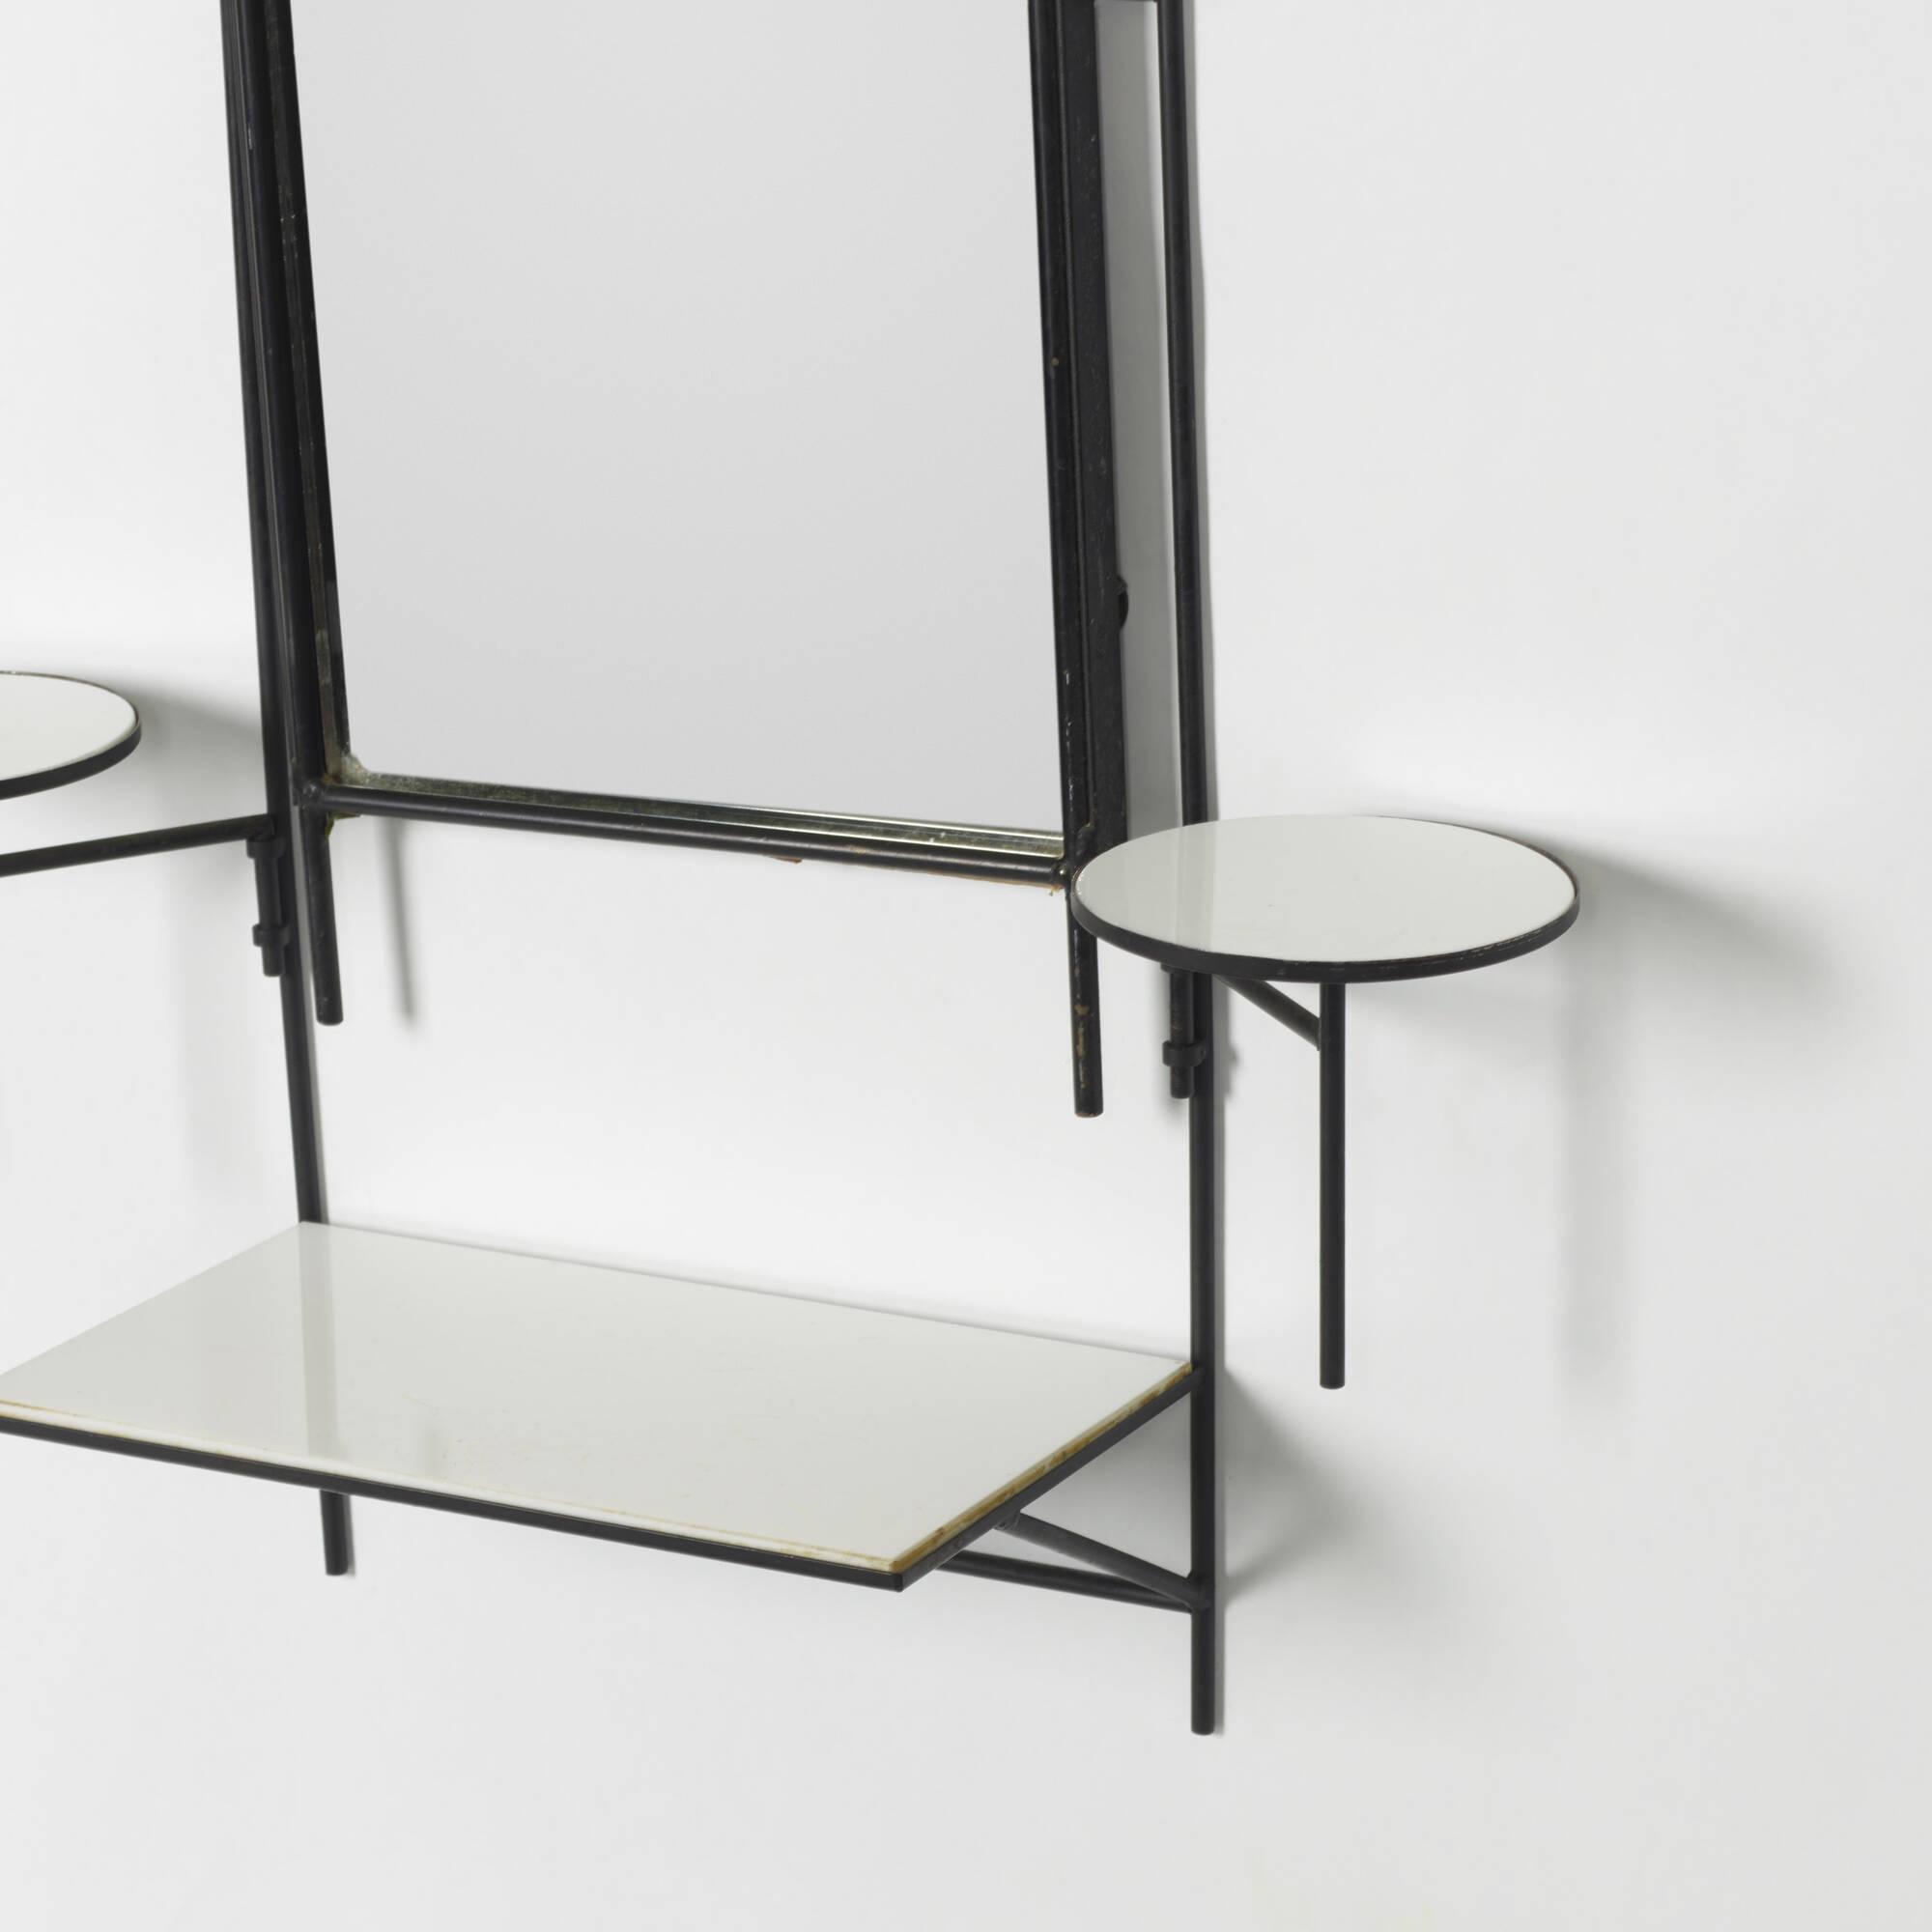 167: PAUL MCCOBB, wall-mounted vanity and stool < Paul McCobb, 29 ...